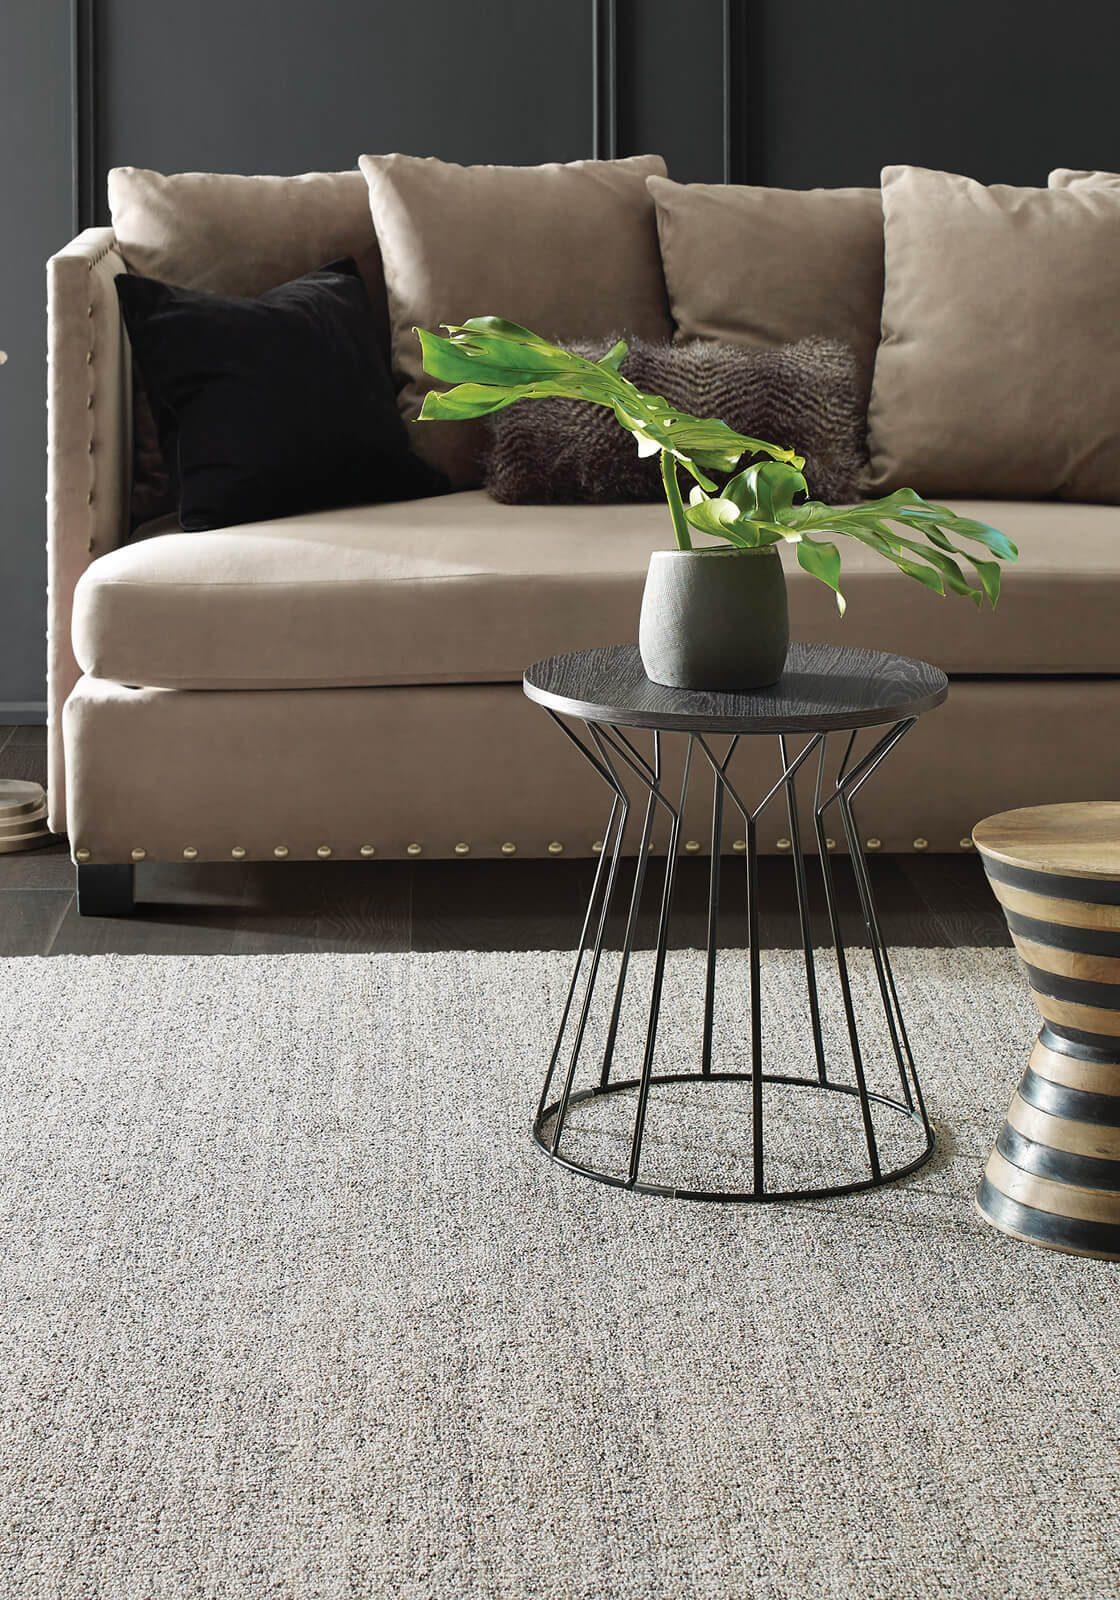 Kensington flooring | Great Lakes Carpet & Tile